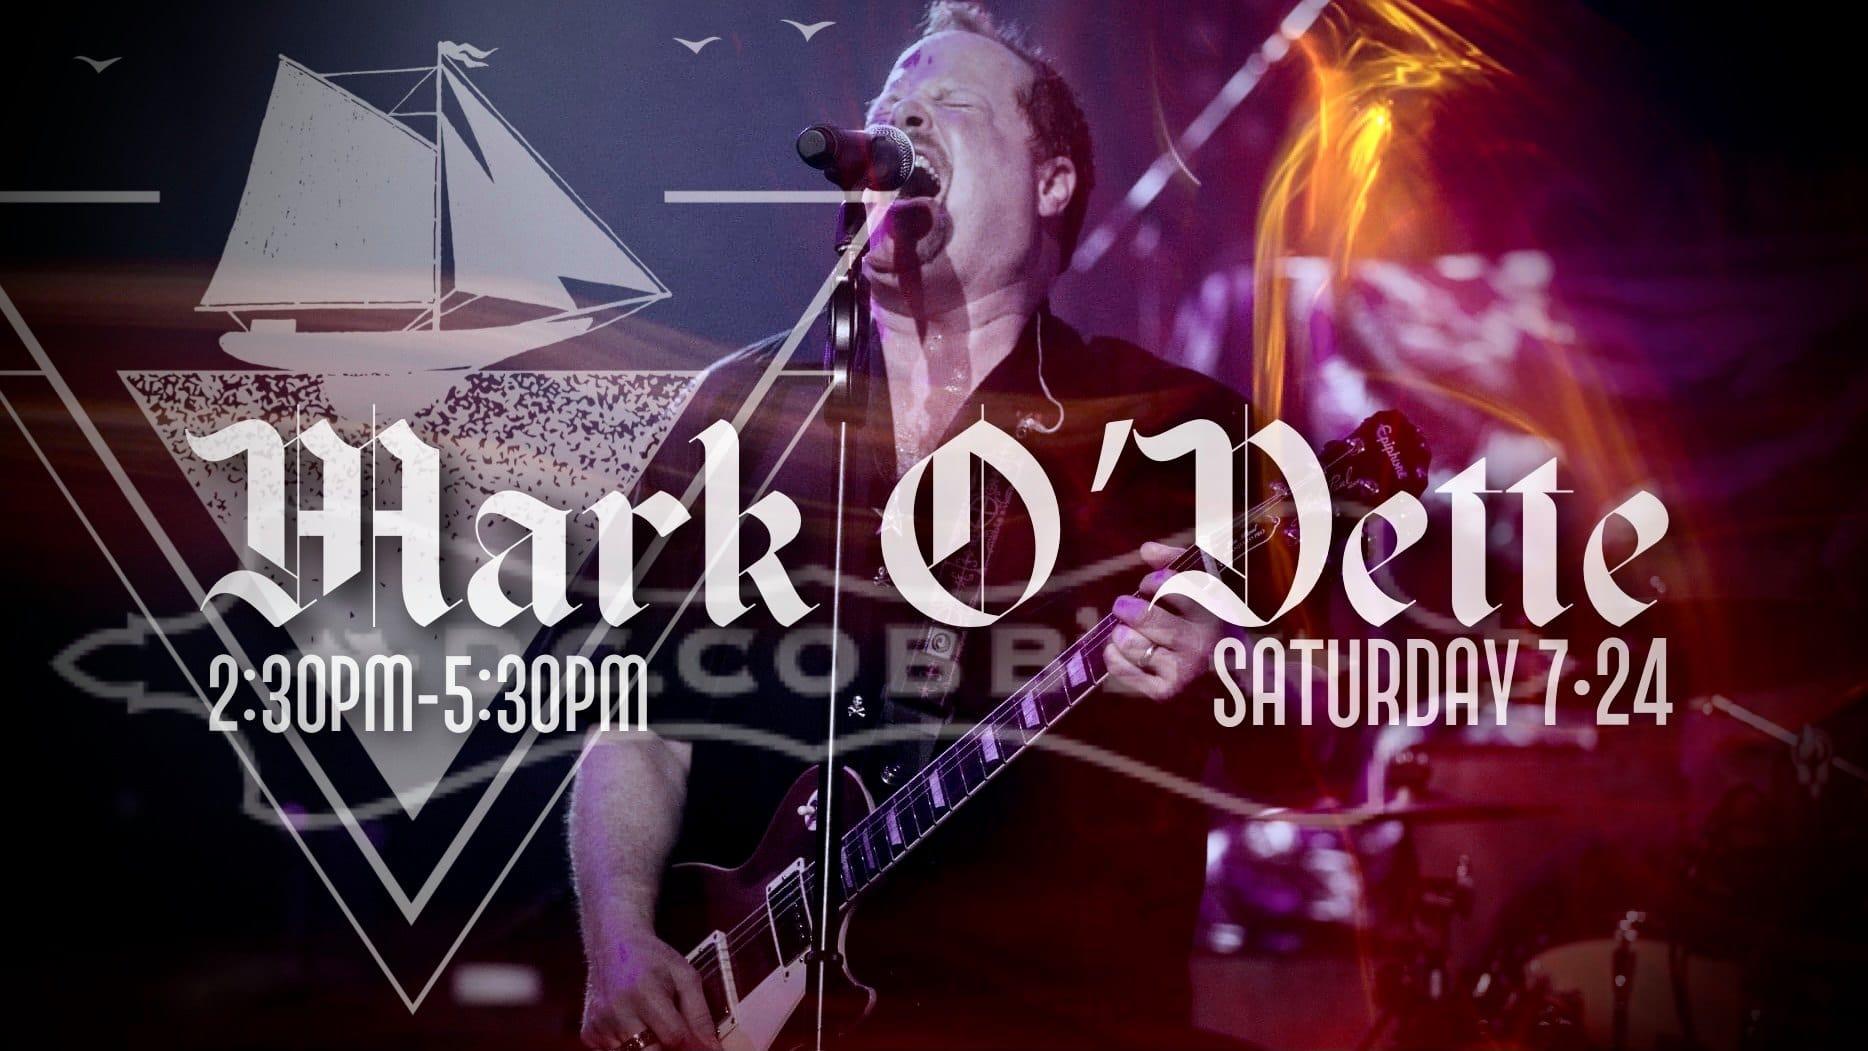 Mark O'Dette – Simply Yacht Rock outside D.C. Cobbs on Benton Street